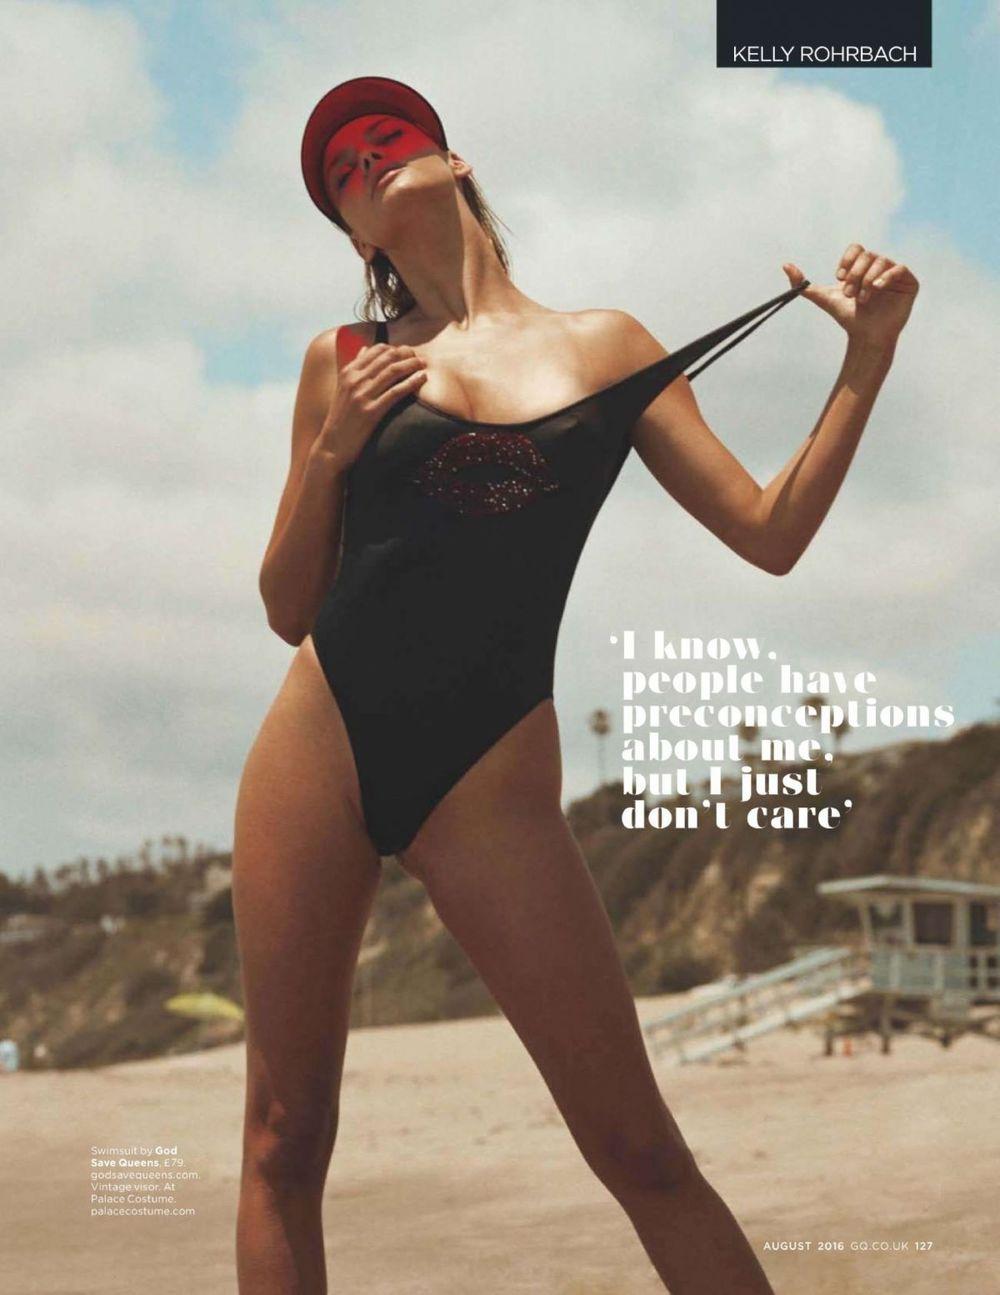 kelly-rohrbach-in-gq-magazine-august-2016- (2).jpg